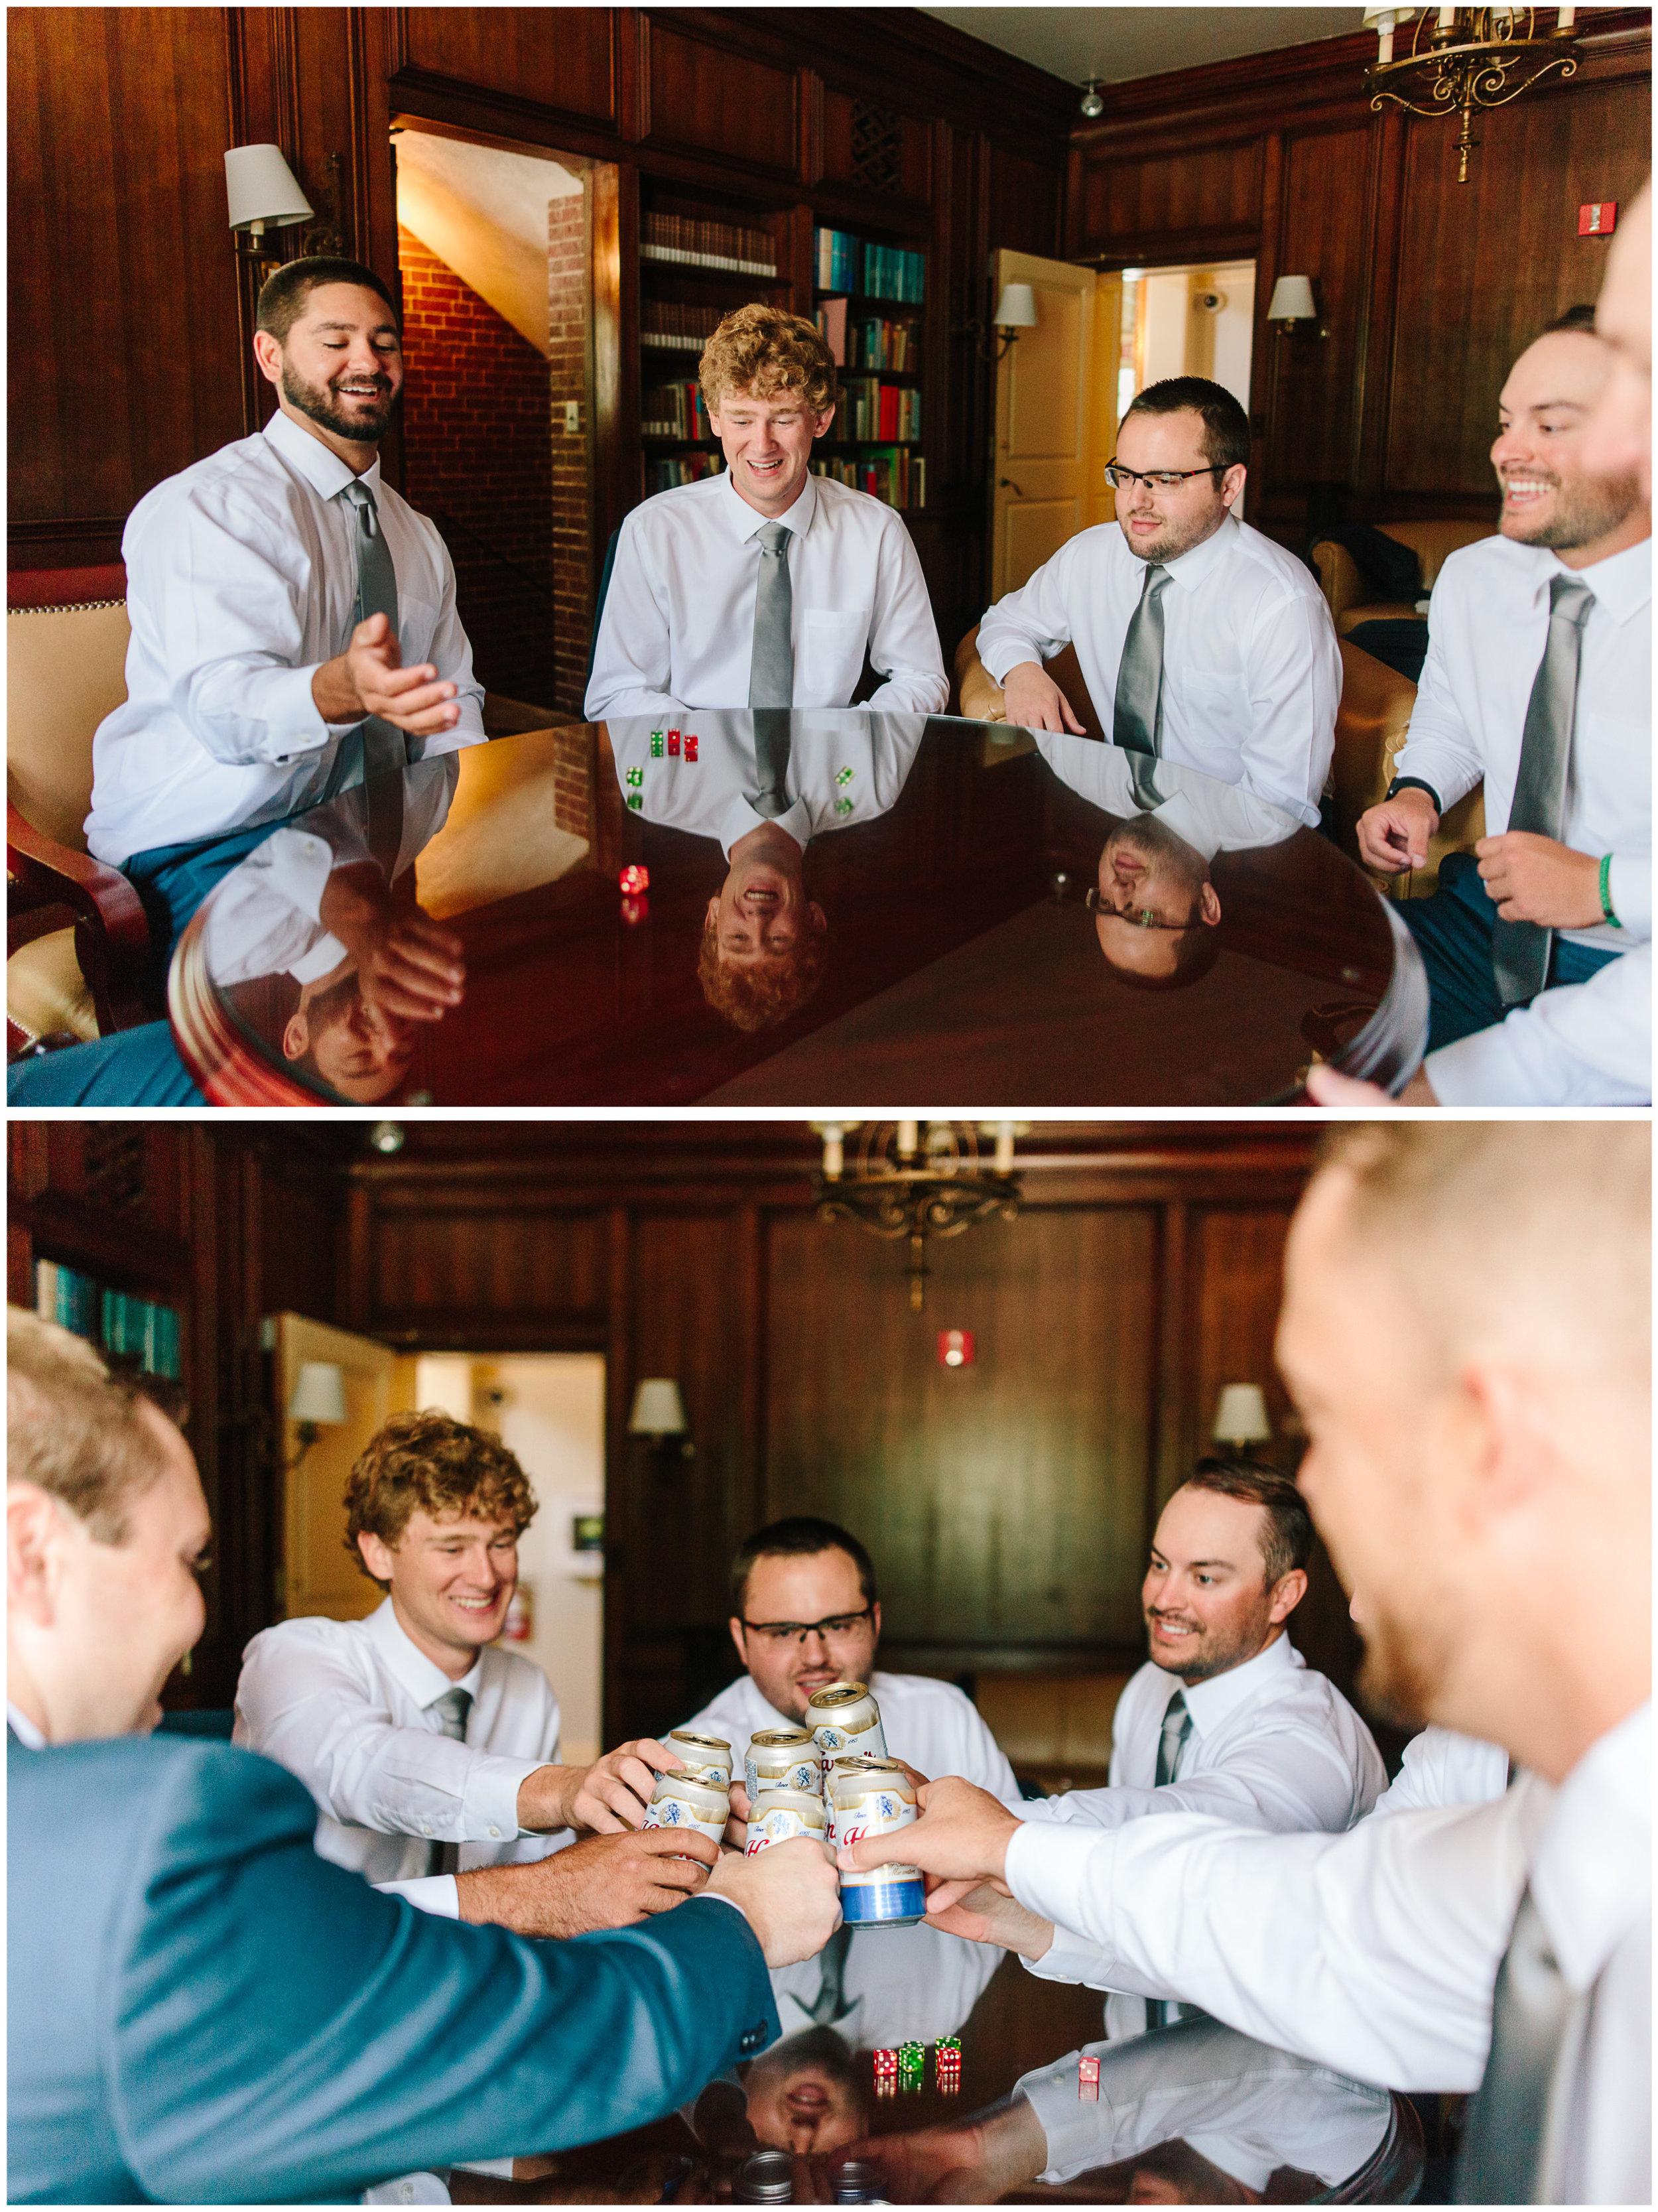 ann_arbor_michigan_wedding_28.jpg